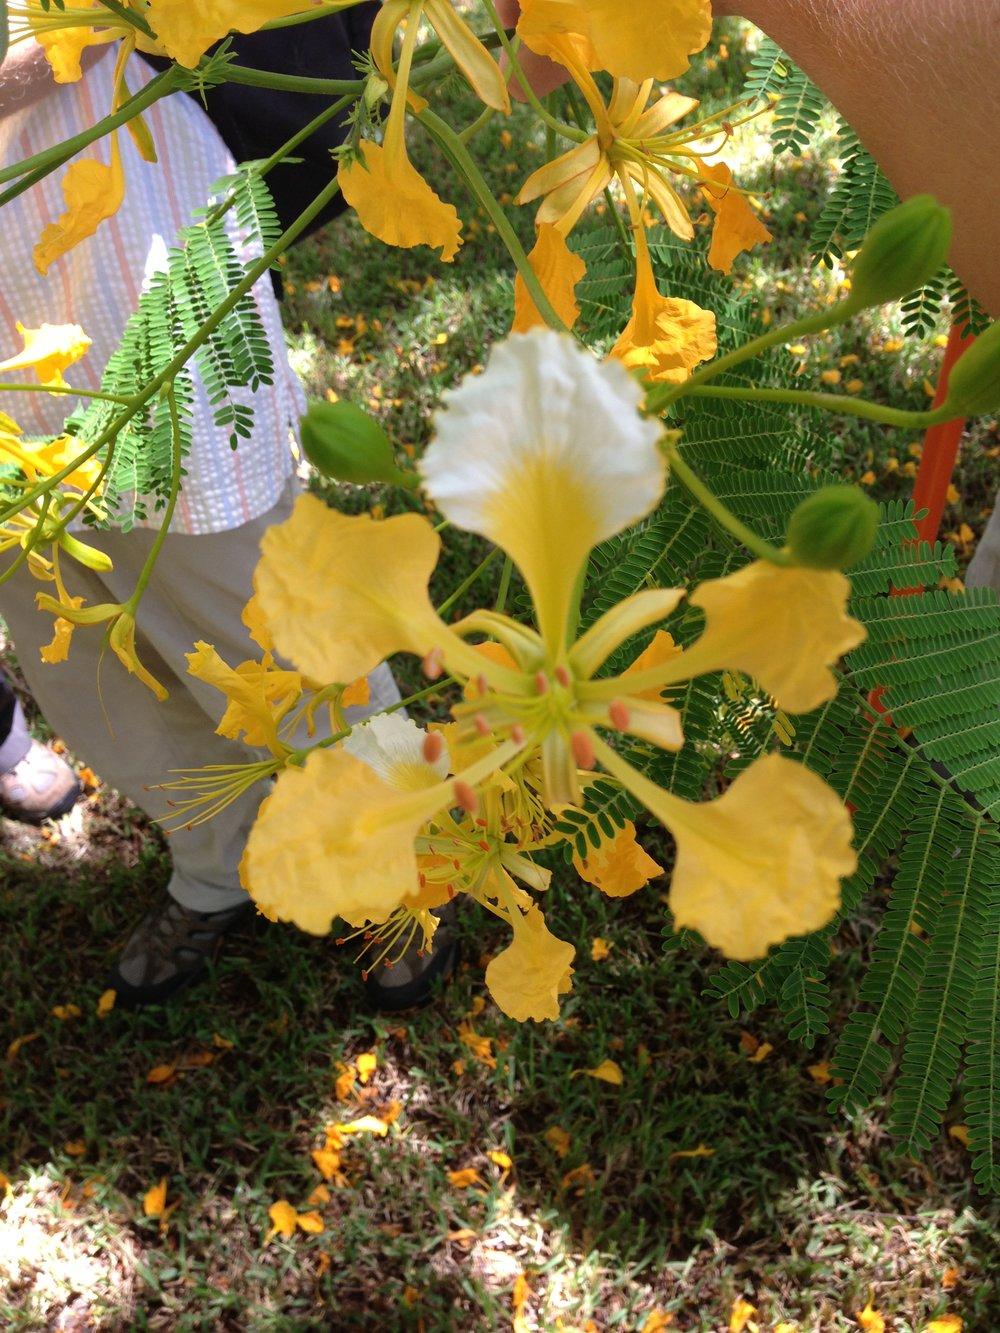 The yellow Royal Poinciana!